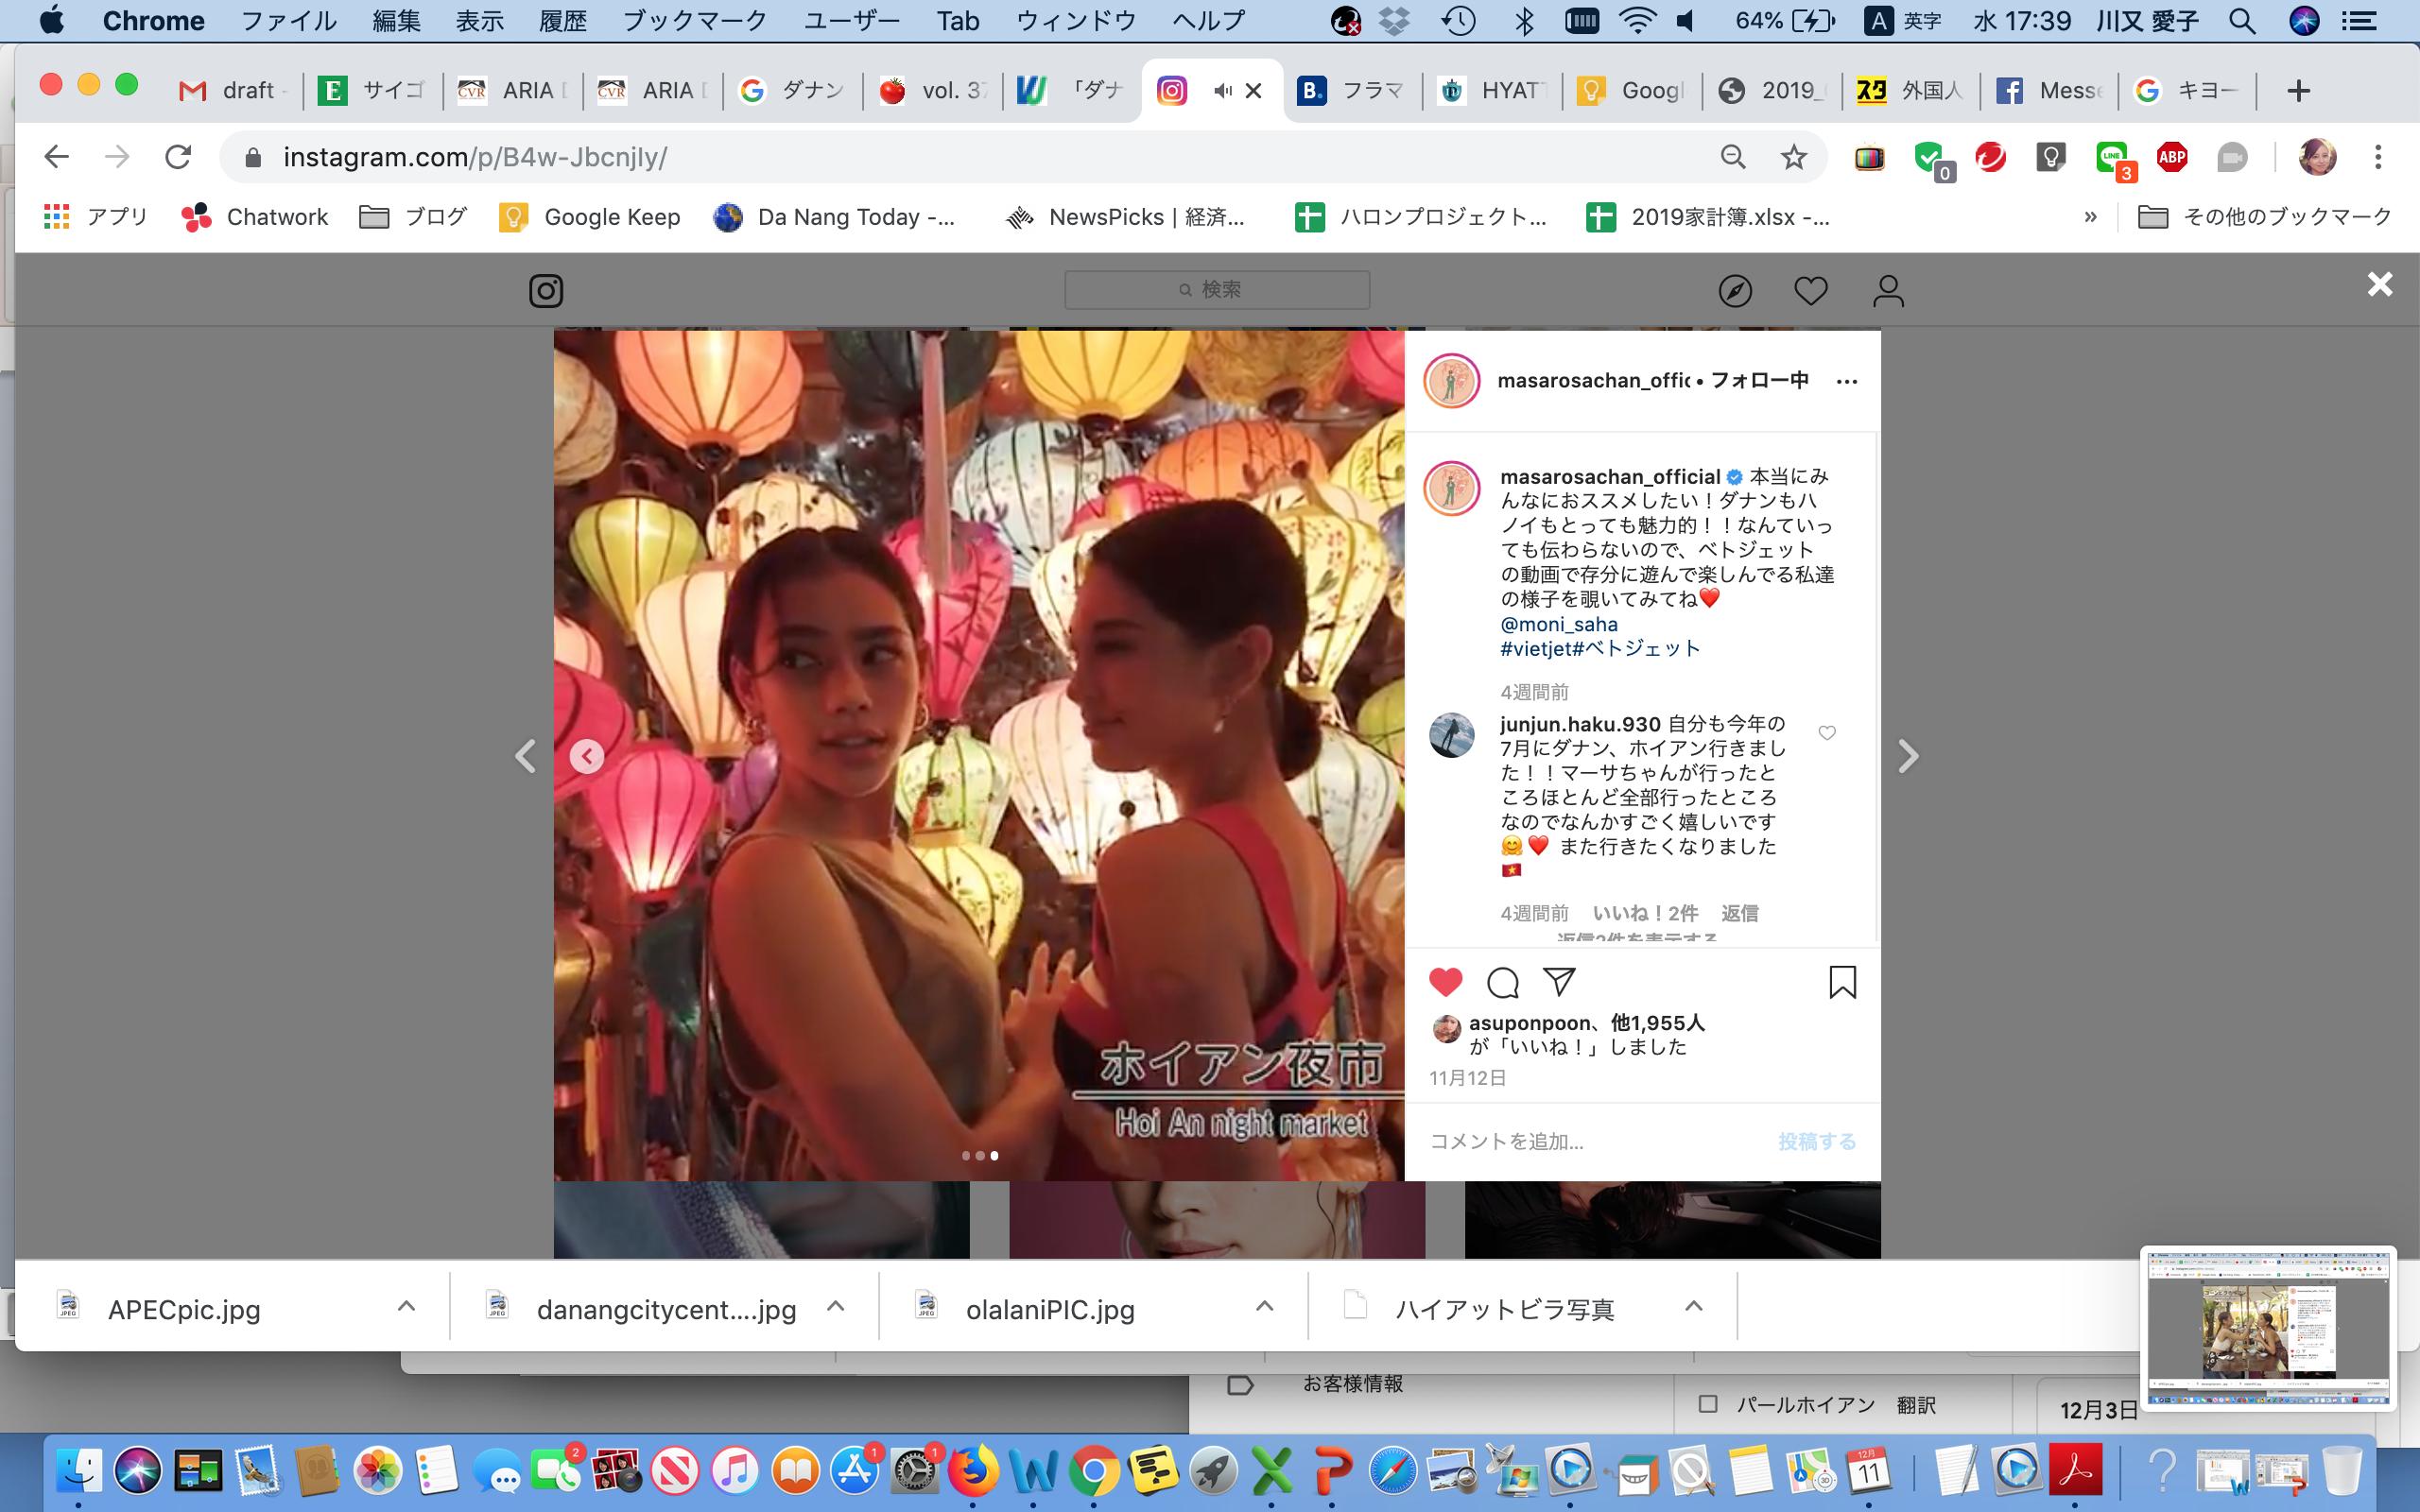 Macintosh HD:Users:kawamataaiko:Desktop:スクリーンショット 2019-12-11 17.39.25.png